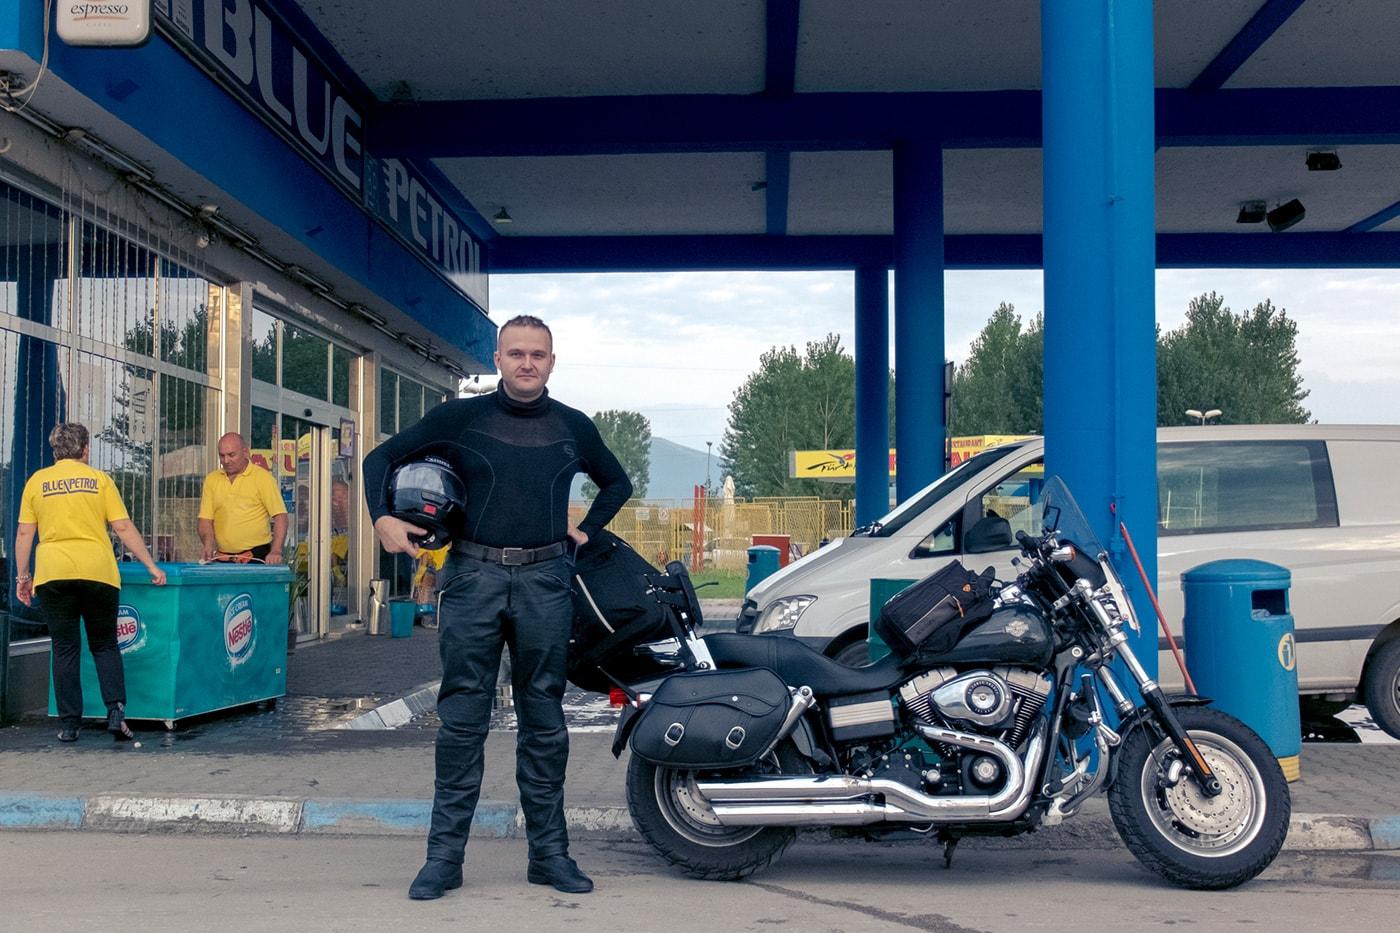 balcani-in-moto-uomo-mezzo-polacco